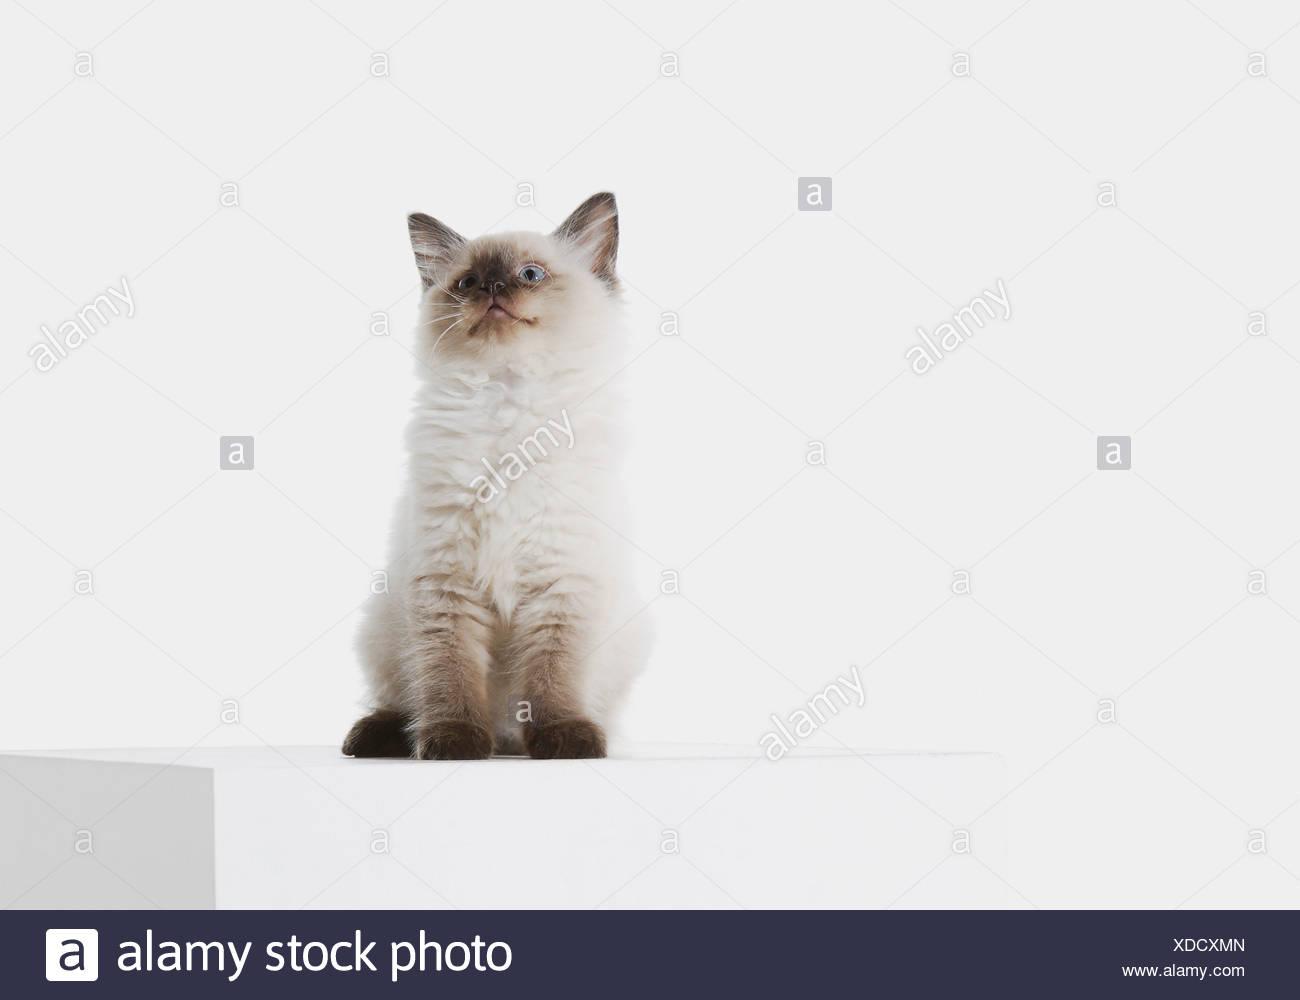 Sitting Ragdoll Cat Stock Photos & Sitting Ragdoll Cat Stock